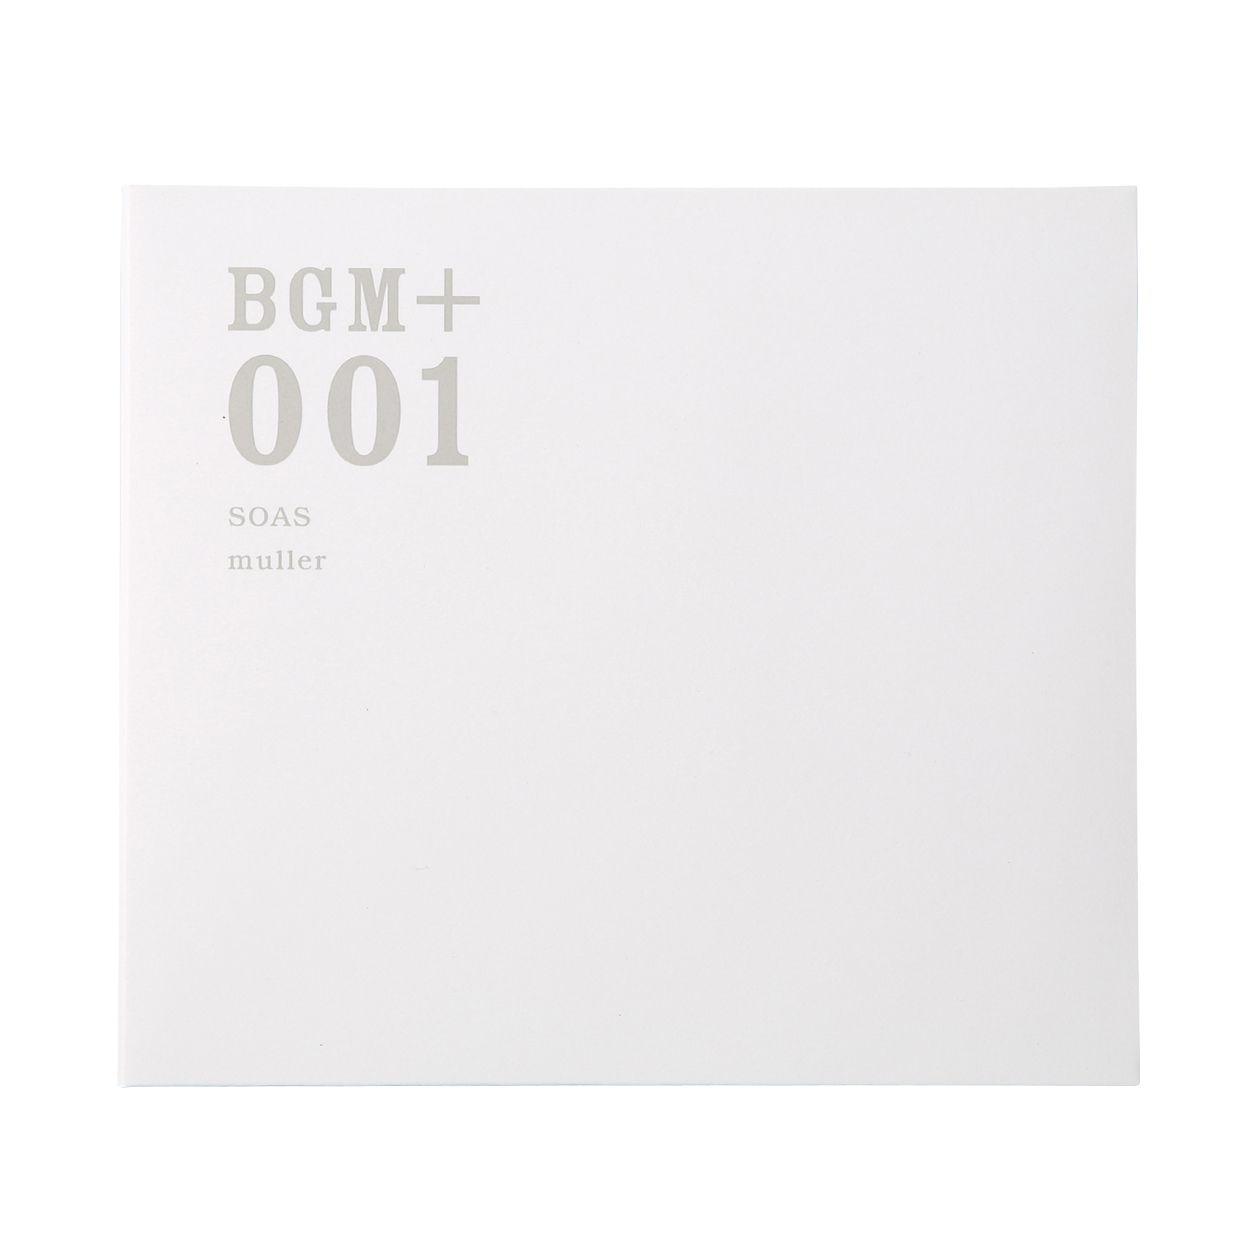 BGM+001